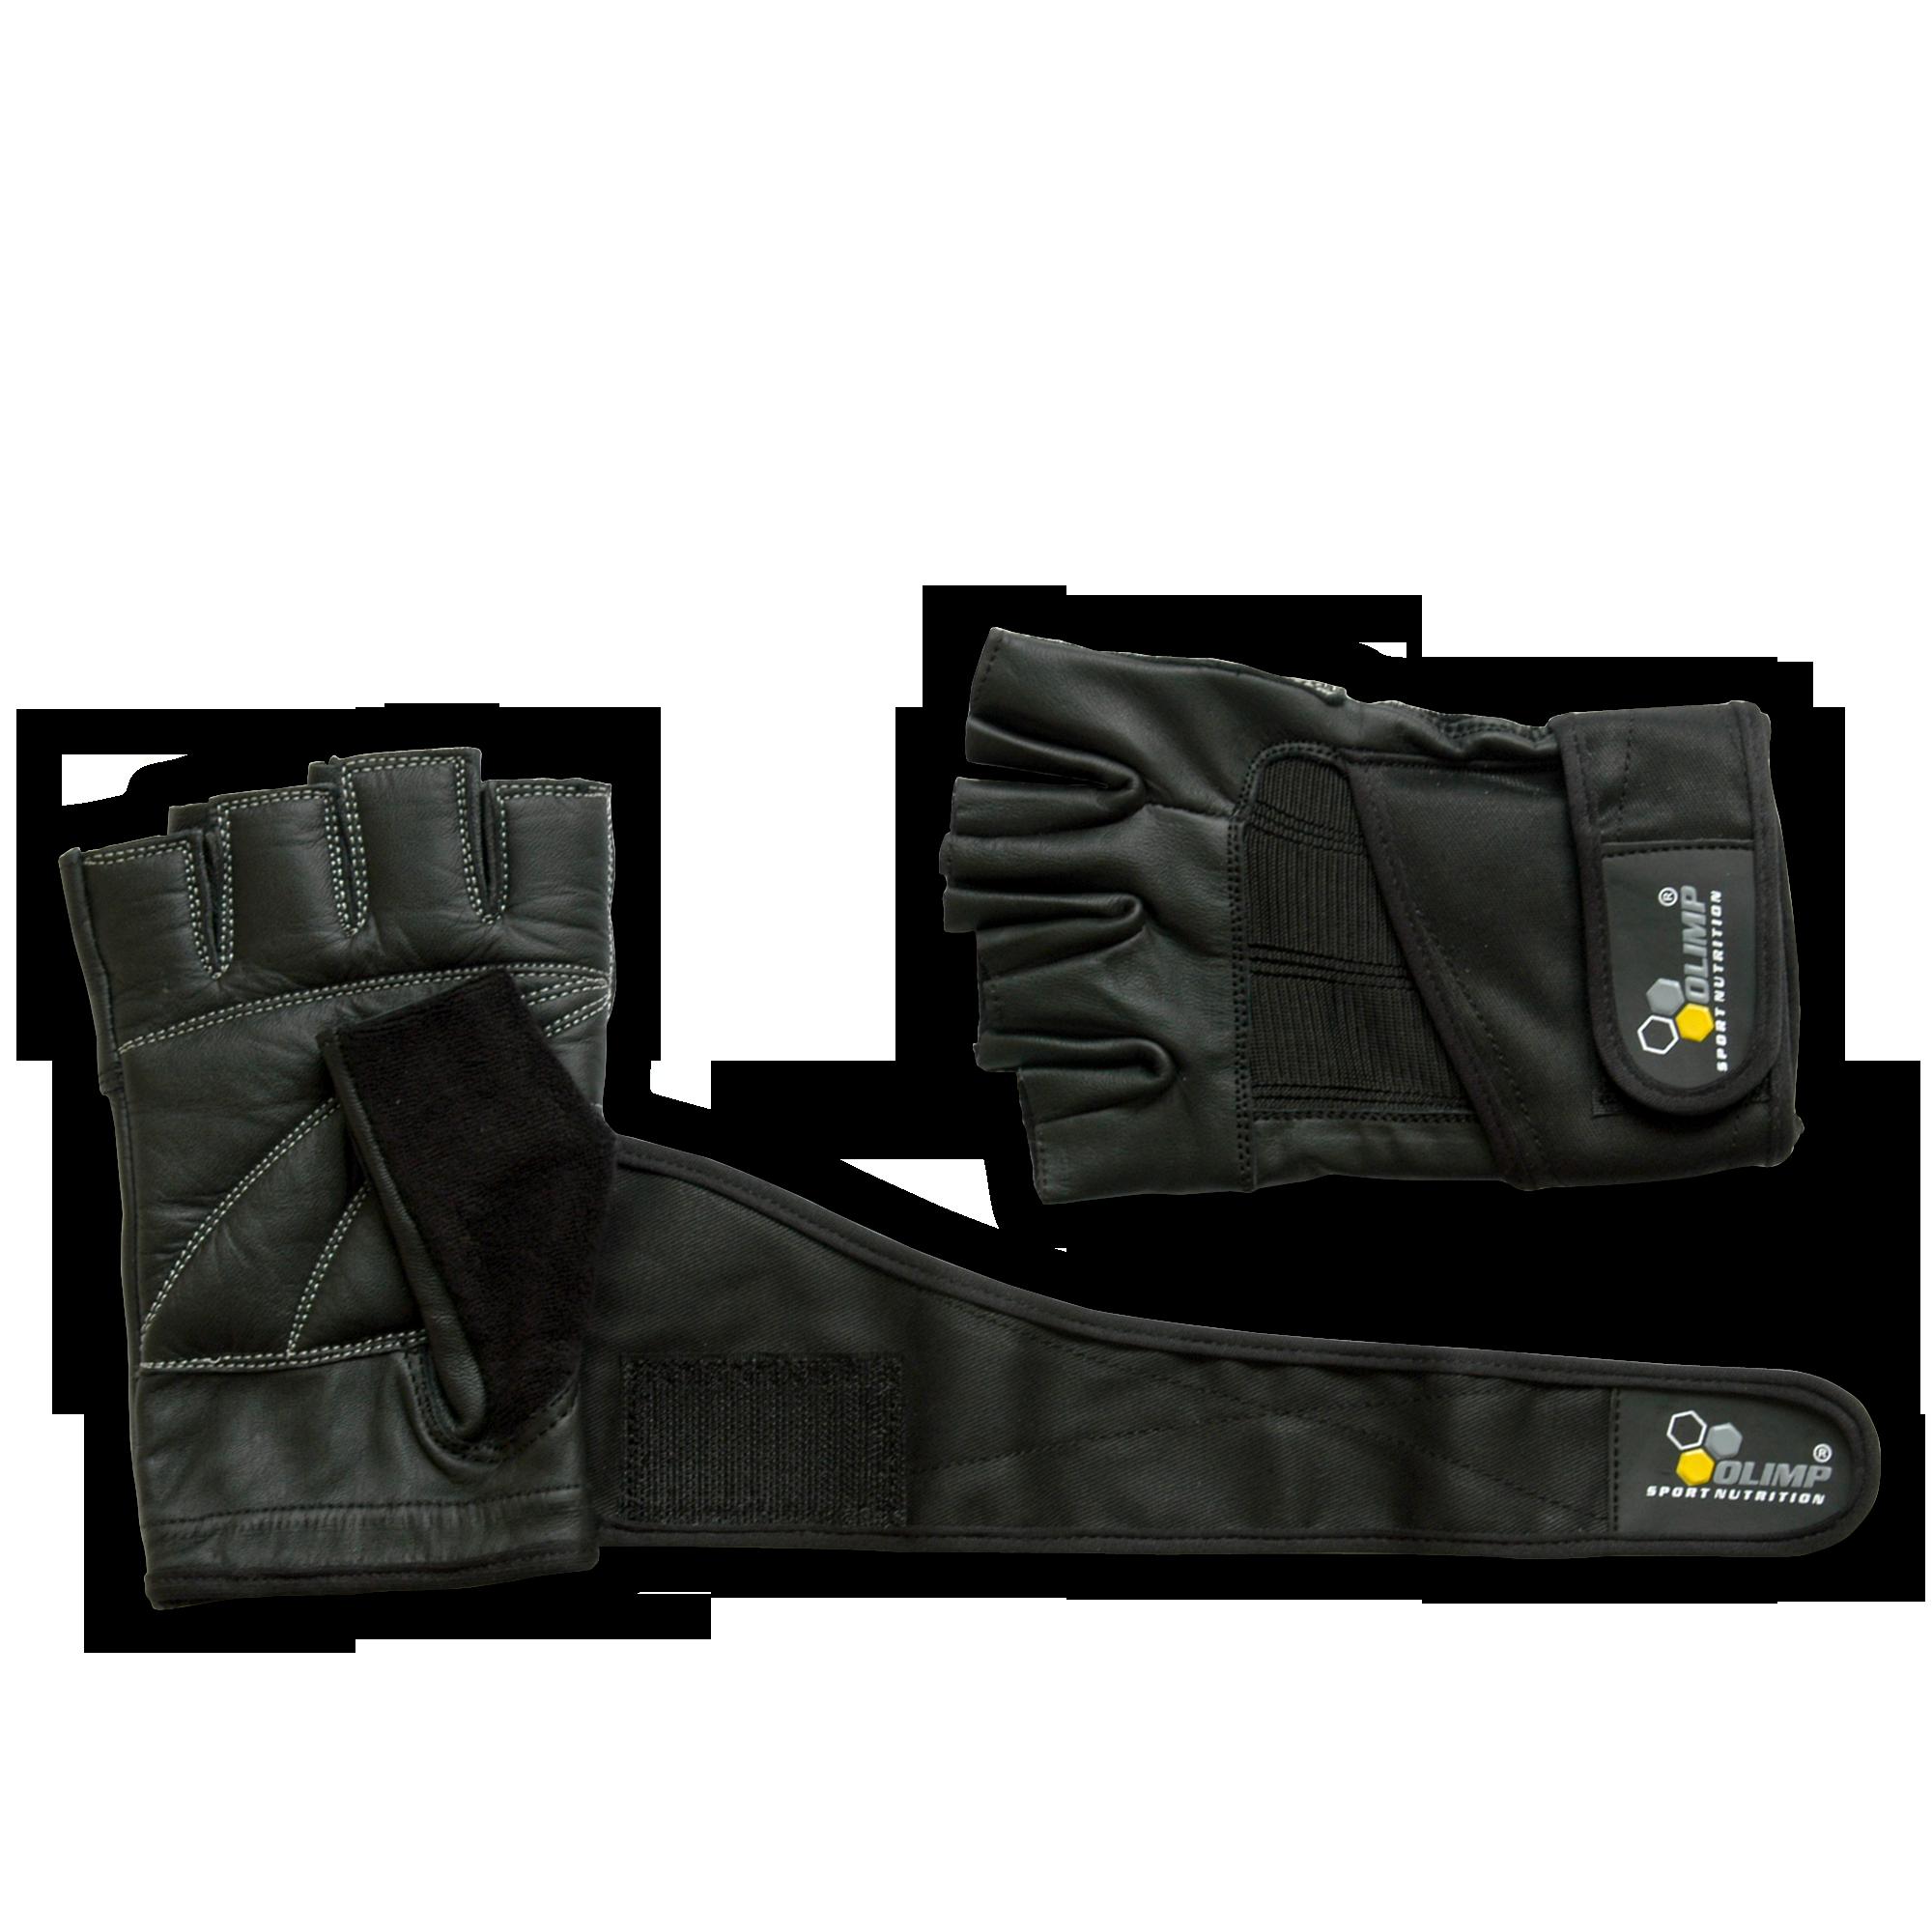 Olimp Sport Nutrition Hardcore Profi rukavice par